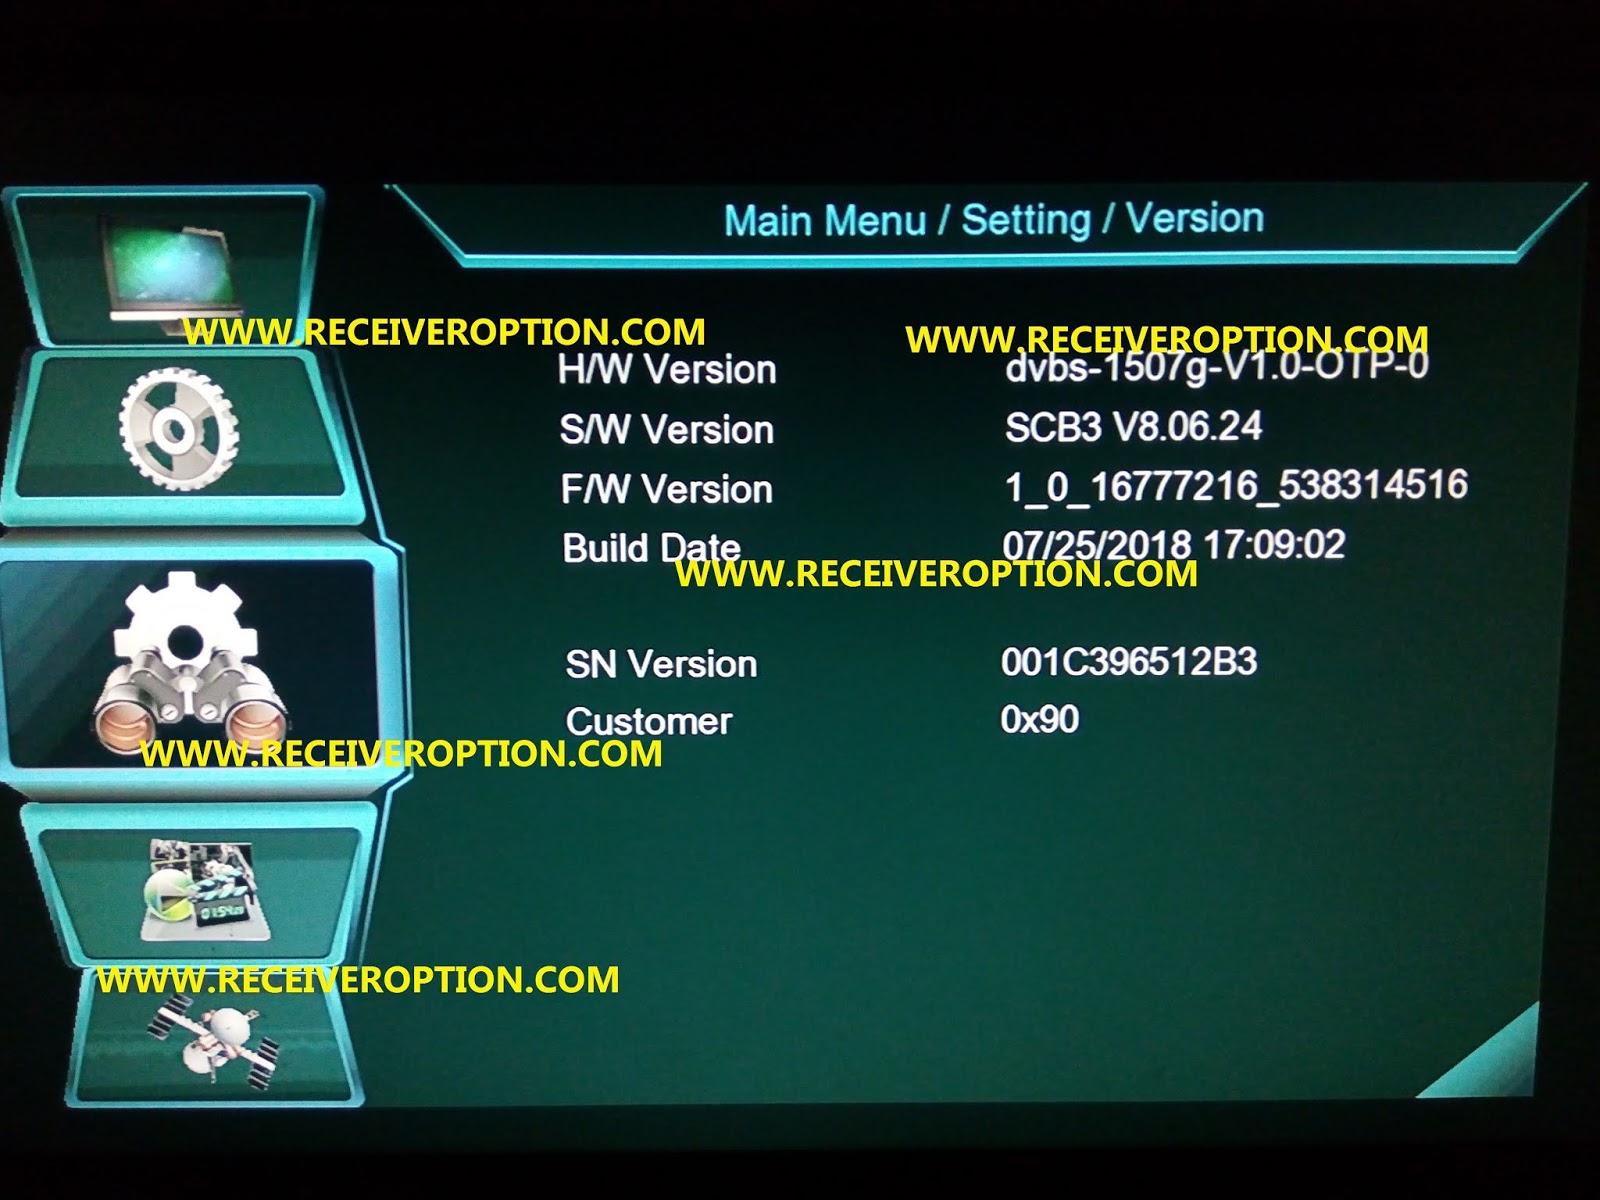 OPENBOX GENIUS HEVC HD RECEIVER AUTO ROLL POWERVU KEY FIX